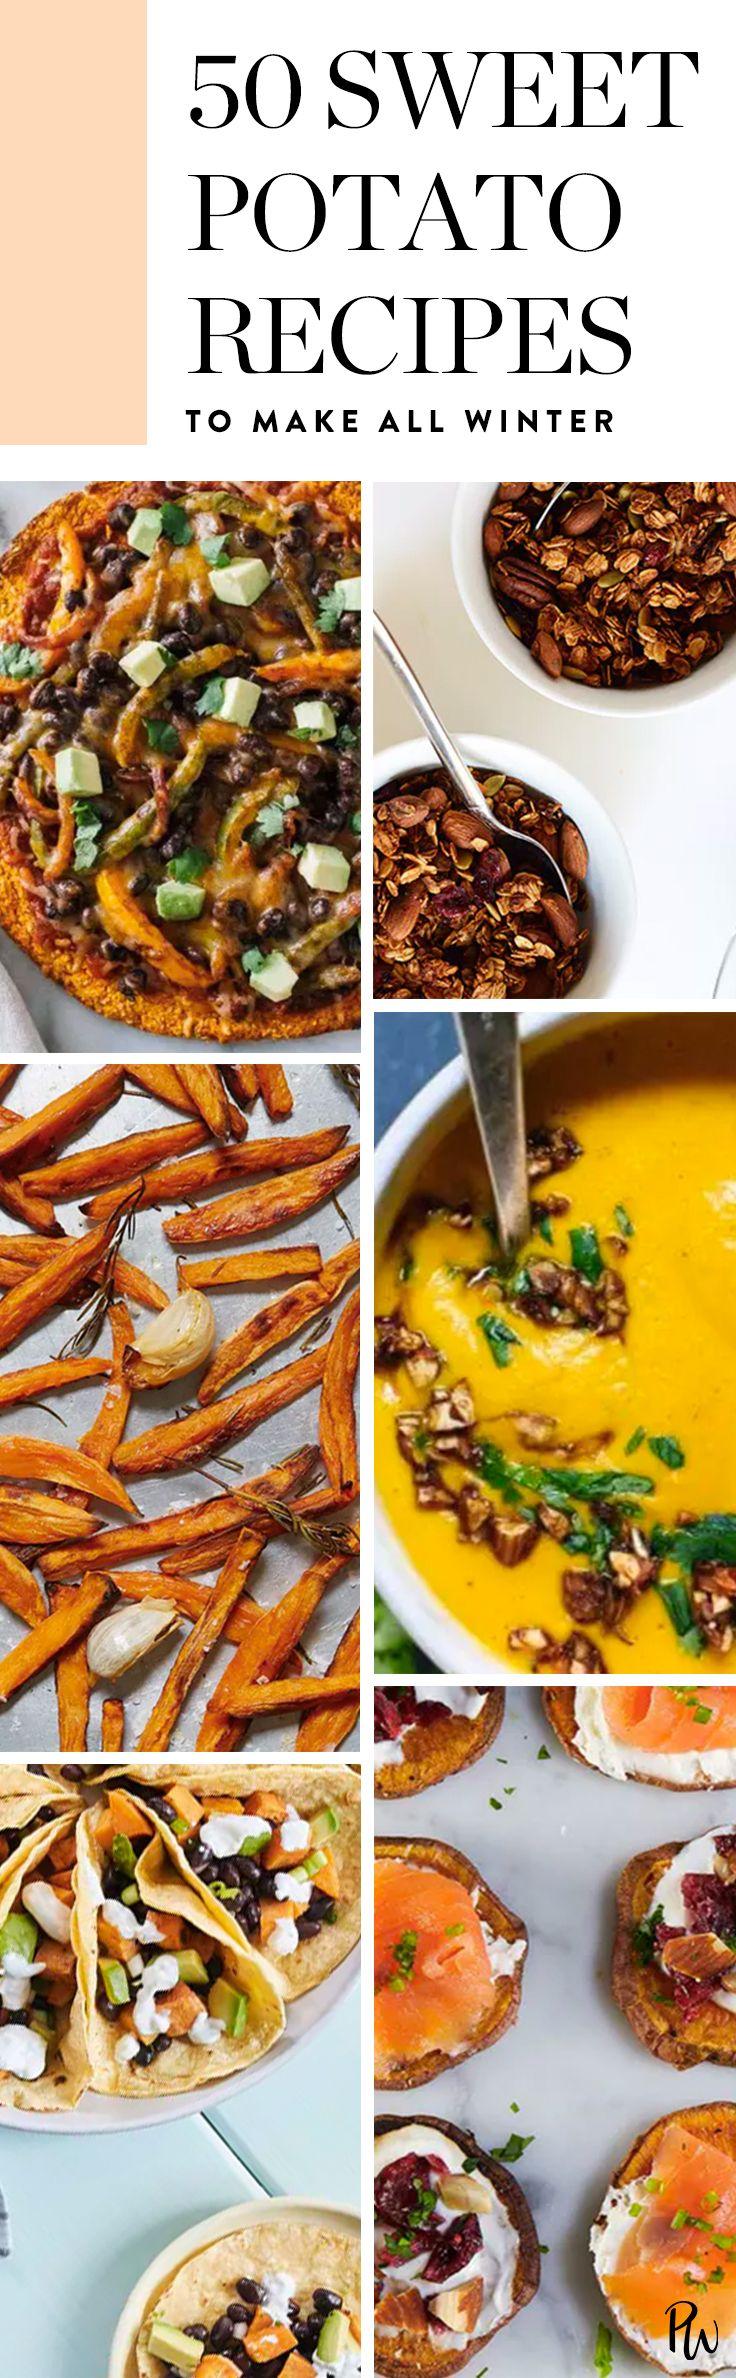 50 Sweet Potato Recipes to Make All Winter Long #dinnerideas #healthyrecipes #healthydinners #dinnerideas #sweetpotatorecipes #easyrecipes #winter #winterrecipes